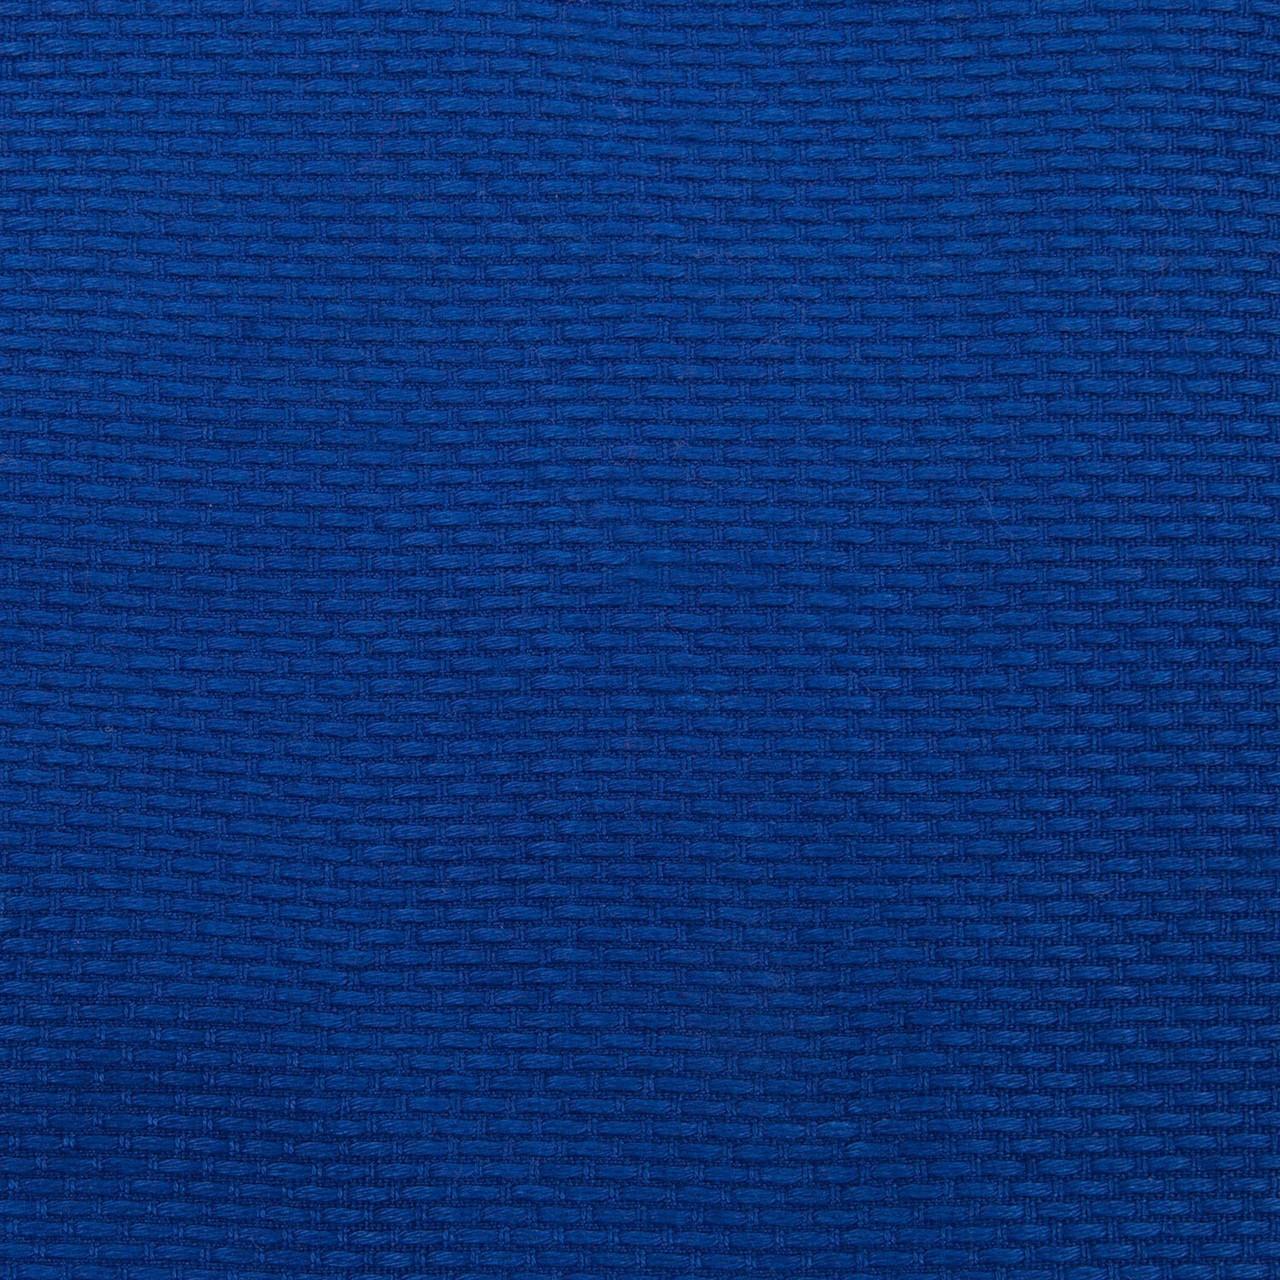 Gi fabric zoom in Venum Contender 2.0 Blue BJJ GI available at www.thejiujitsushop.com  Enjoy Free Shipping from The Jiu Jitsu Shop today!